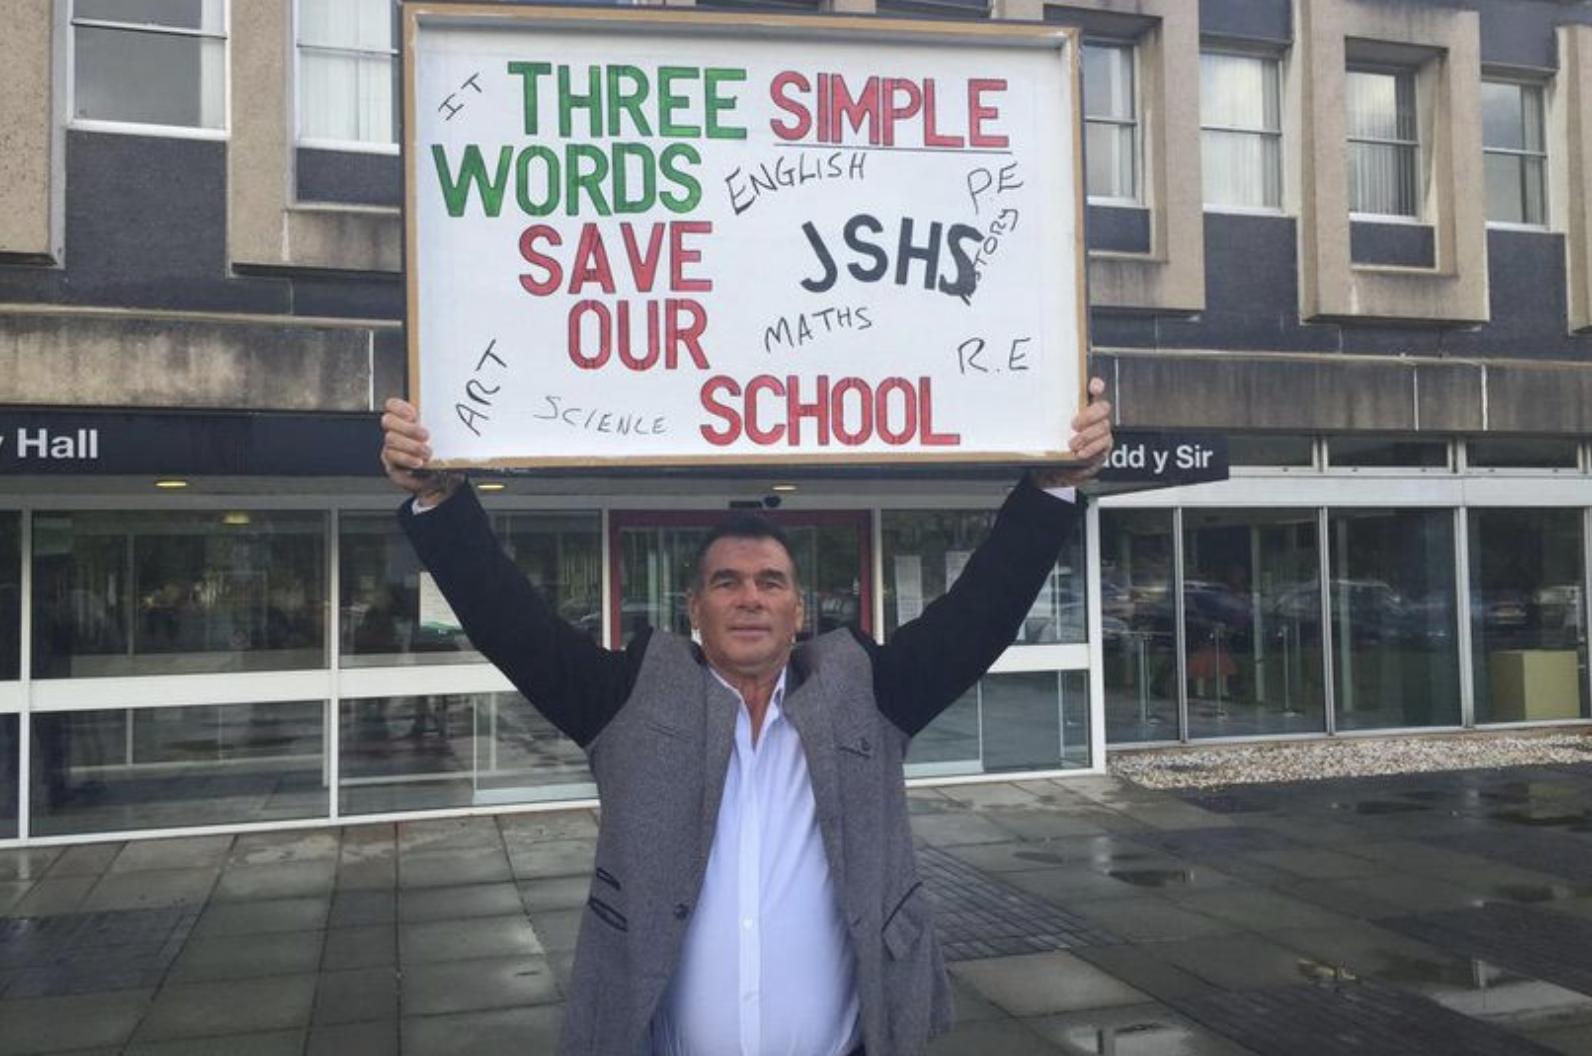 Paddy Doherty Saves School